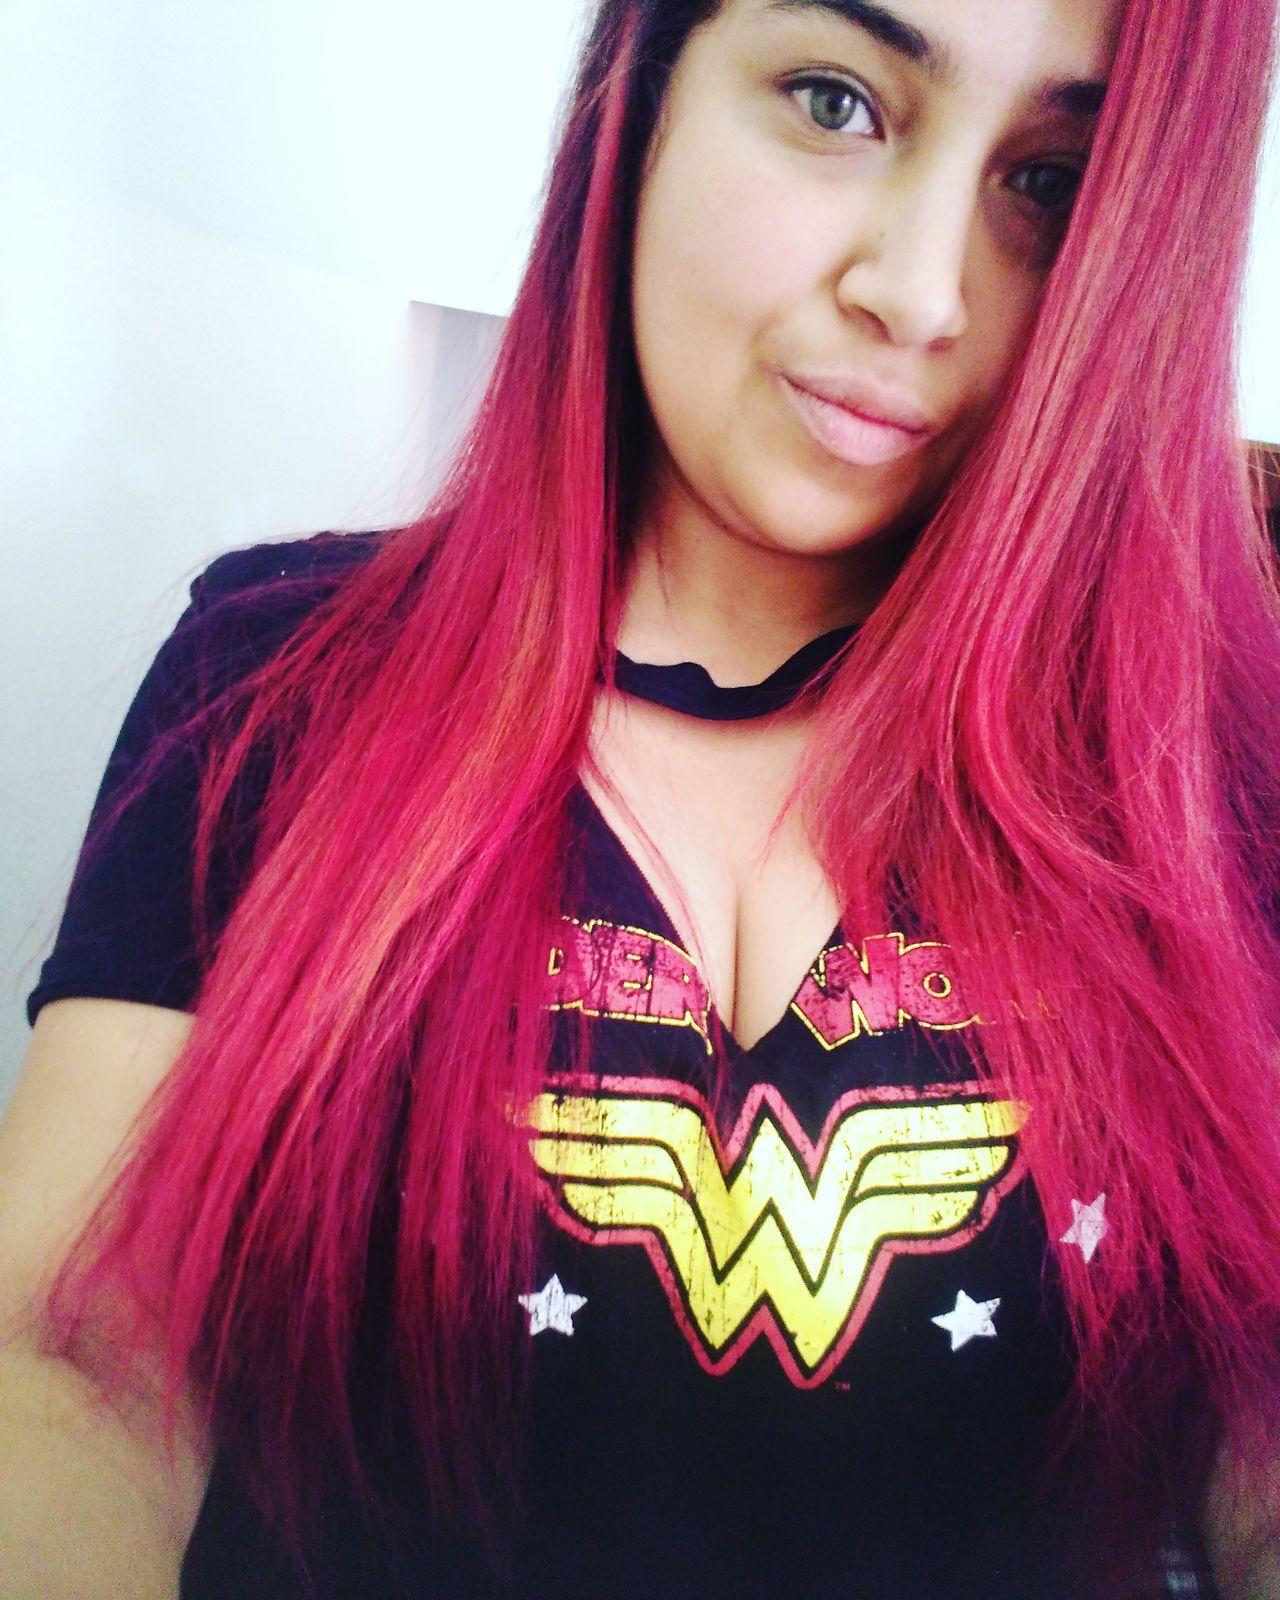 Wonderwoman💪 Followme Followmyinstagram Firefox_anna8 Follow My Facebook @AnnaFortin Selfie Red Hair Manicpanic Looking At Camera Popular Model Young